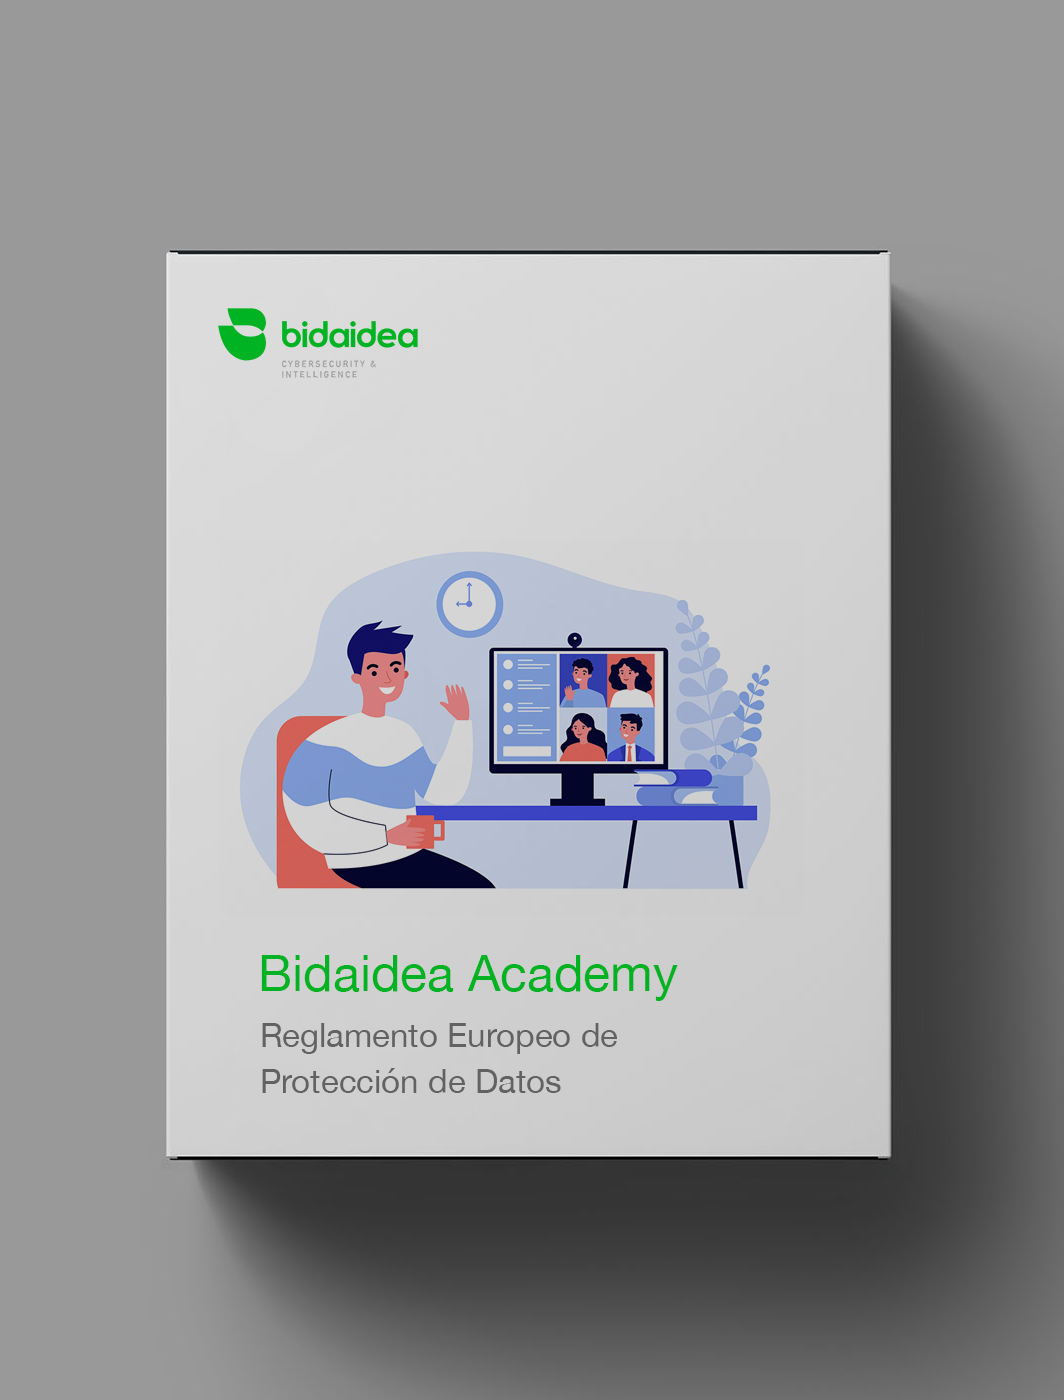 cyberpacks bidaidea academy 03 - Empresa de Ciberseguridad